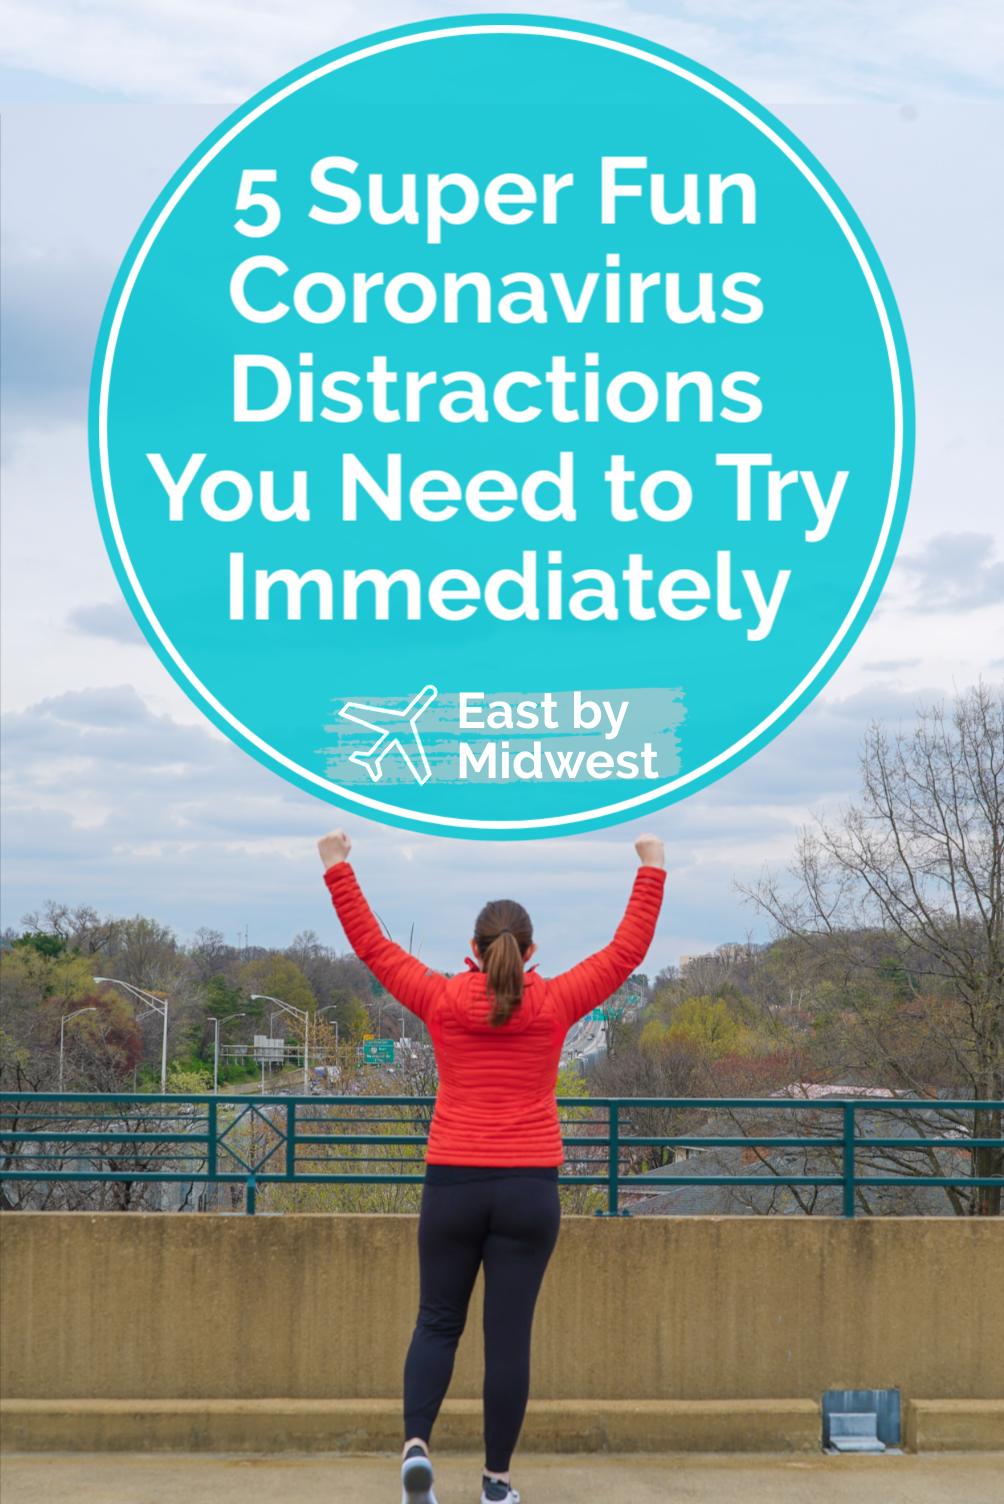 5 Super Fun Coronavirus Distractions You Need to Try Immediately